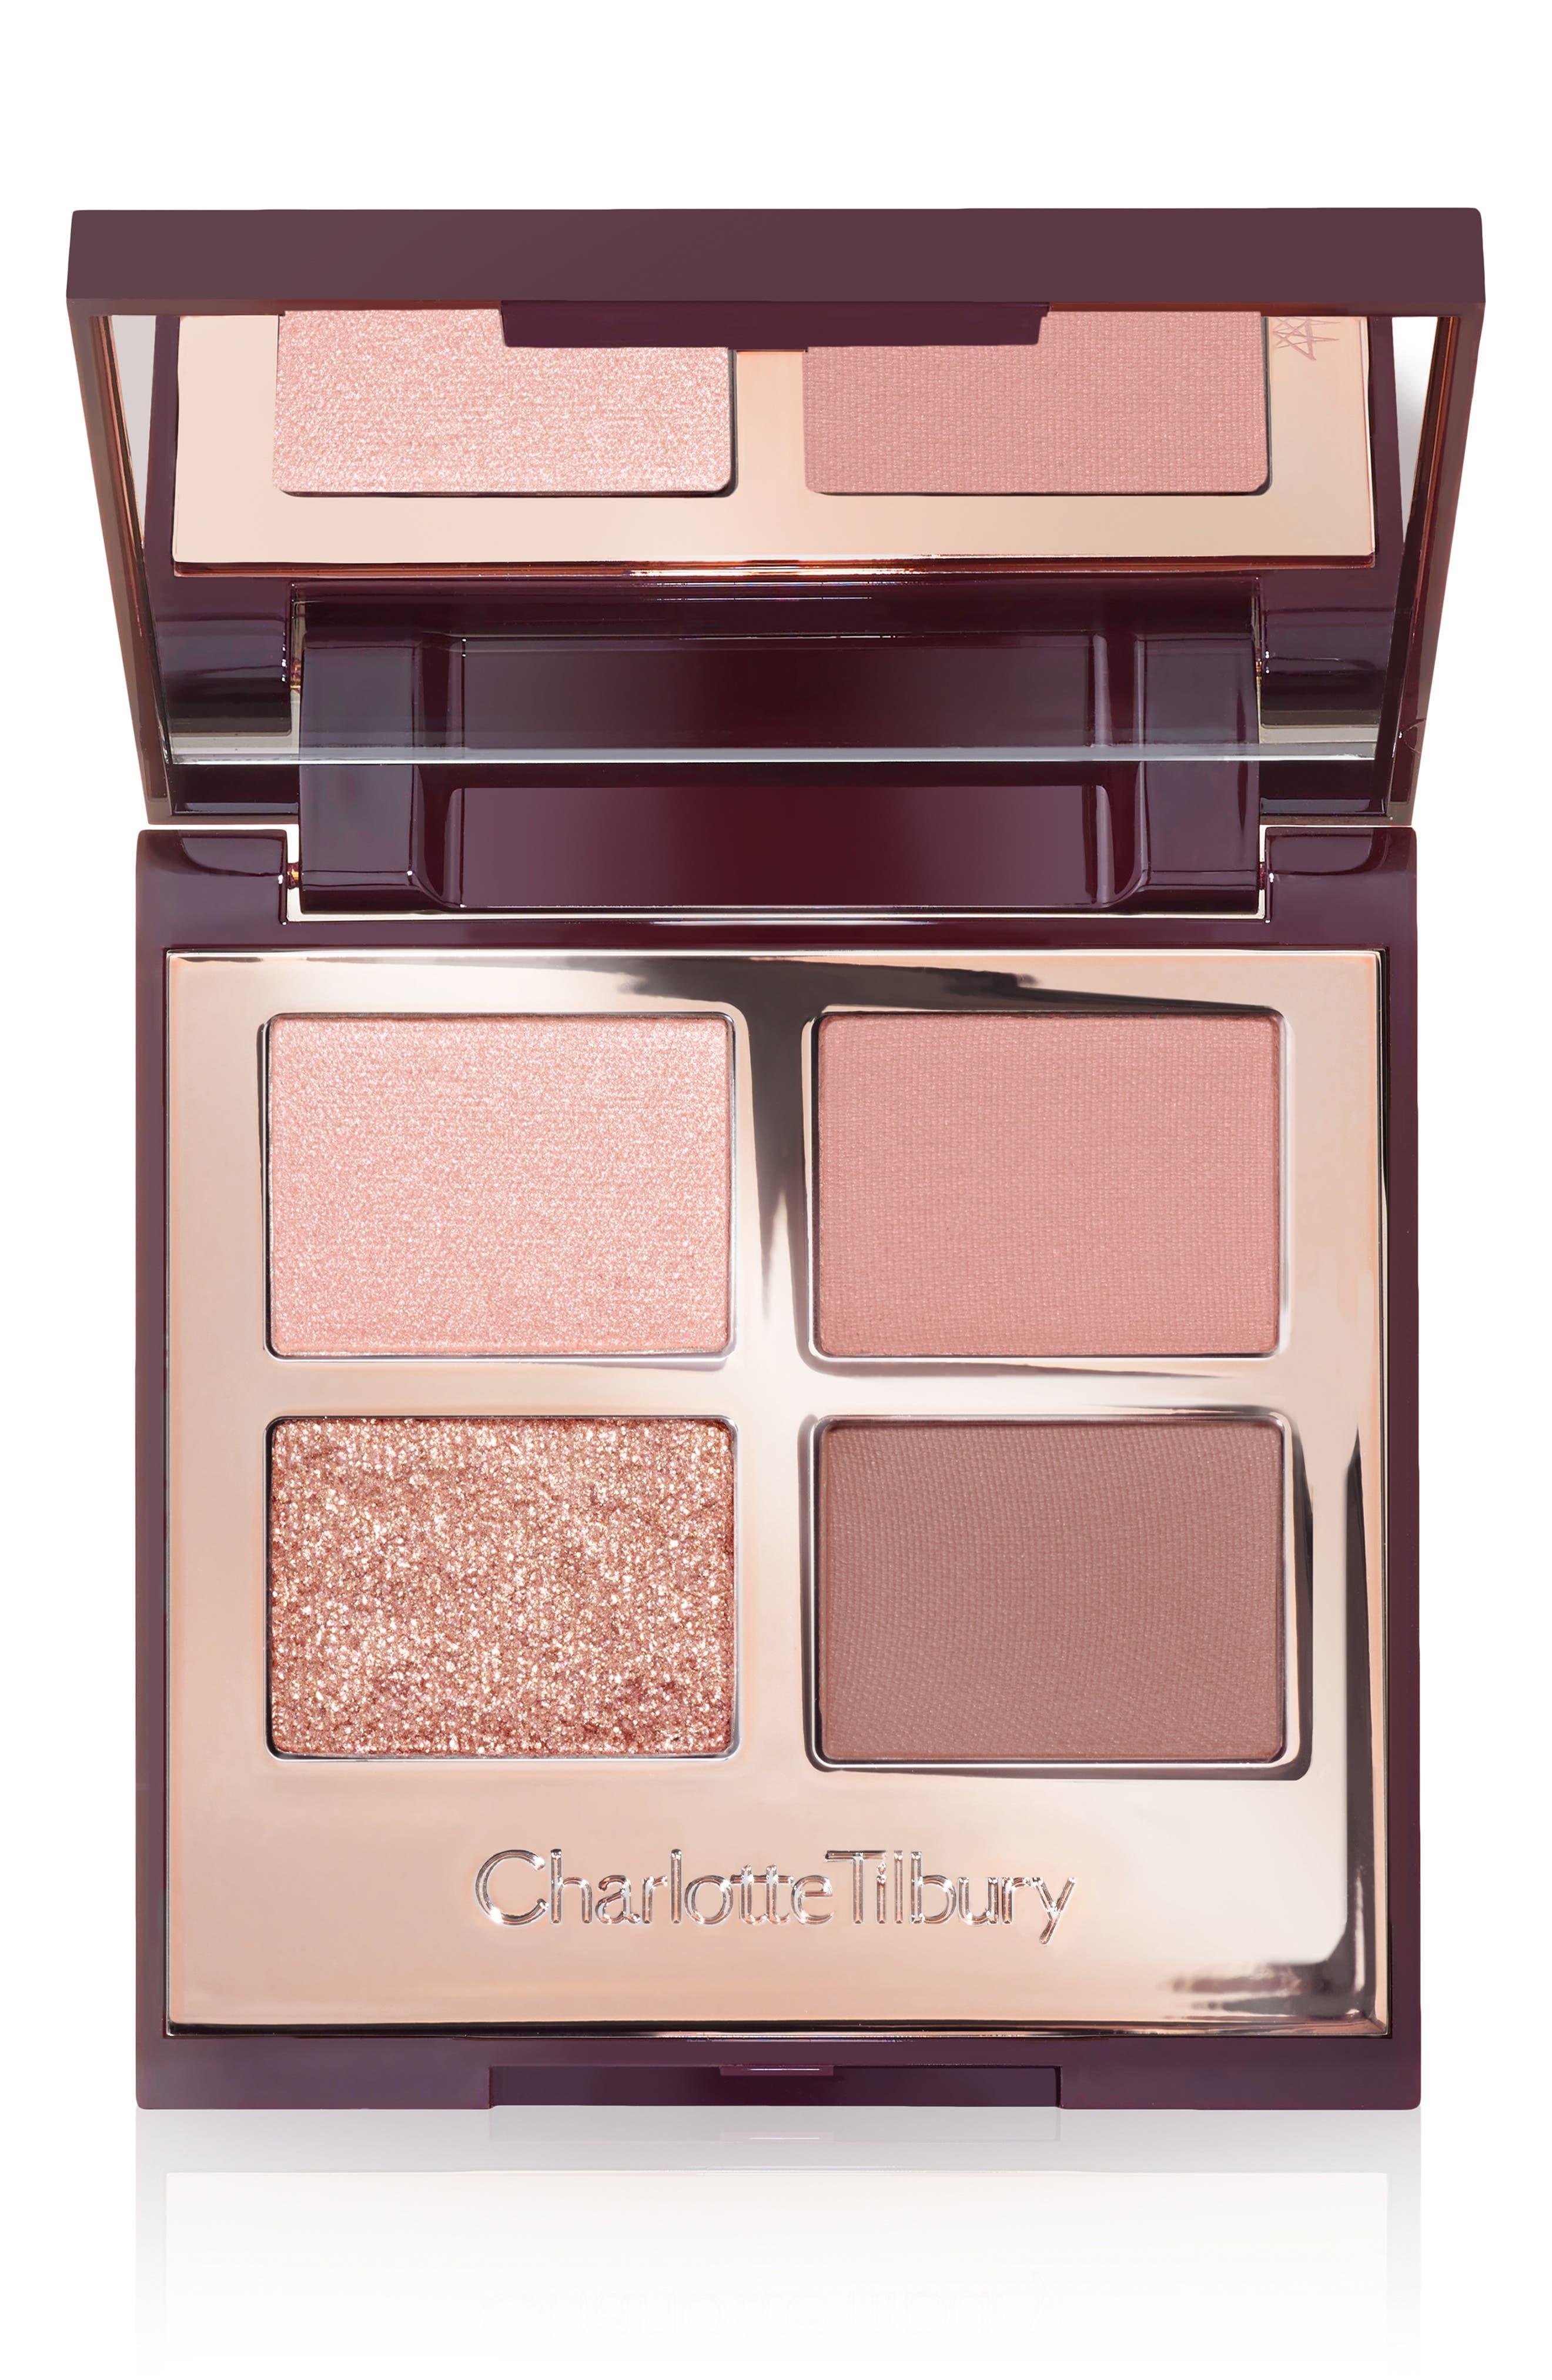 CHARLOTTE TILBURY, Pillowtalk Luxury Eyeshadow Palette, Main thumbnail 1, color, PILLOW TALK